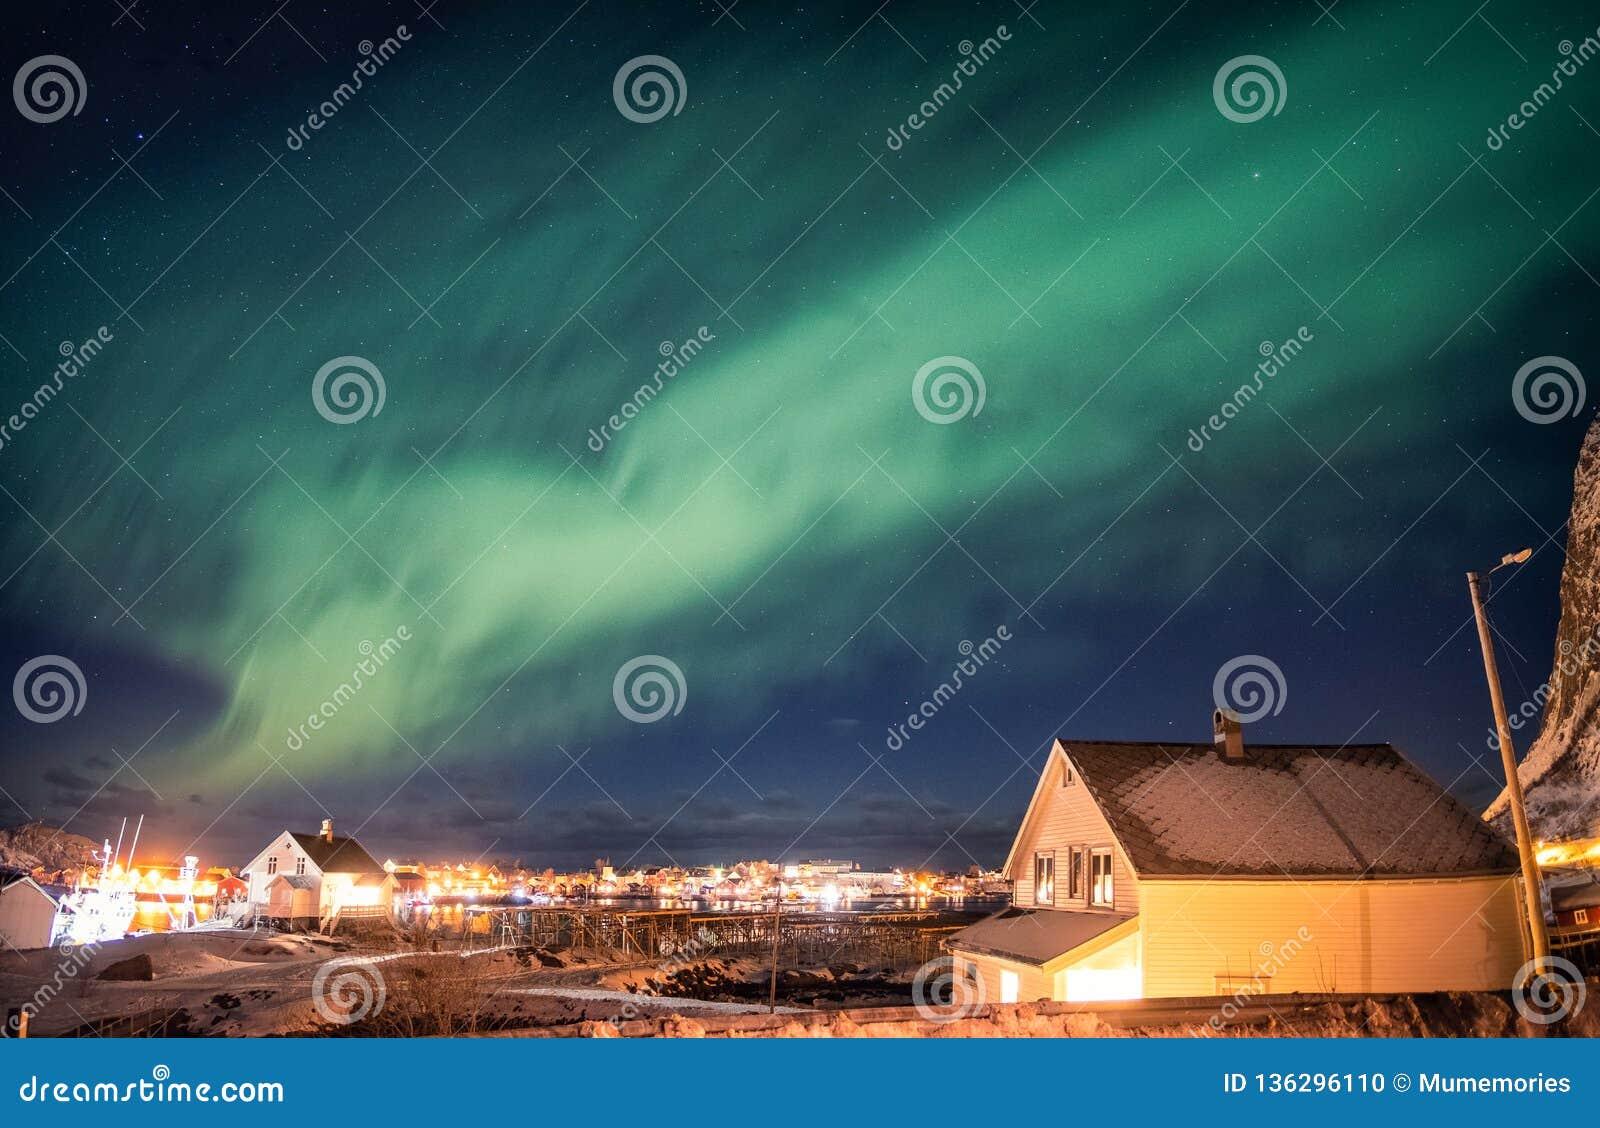 Aurora borealis tanczy nad scandinavian wioską